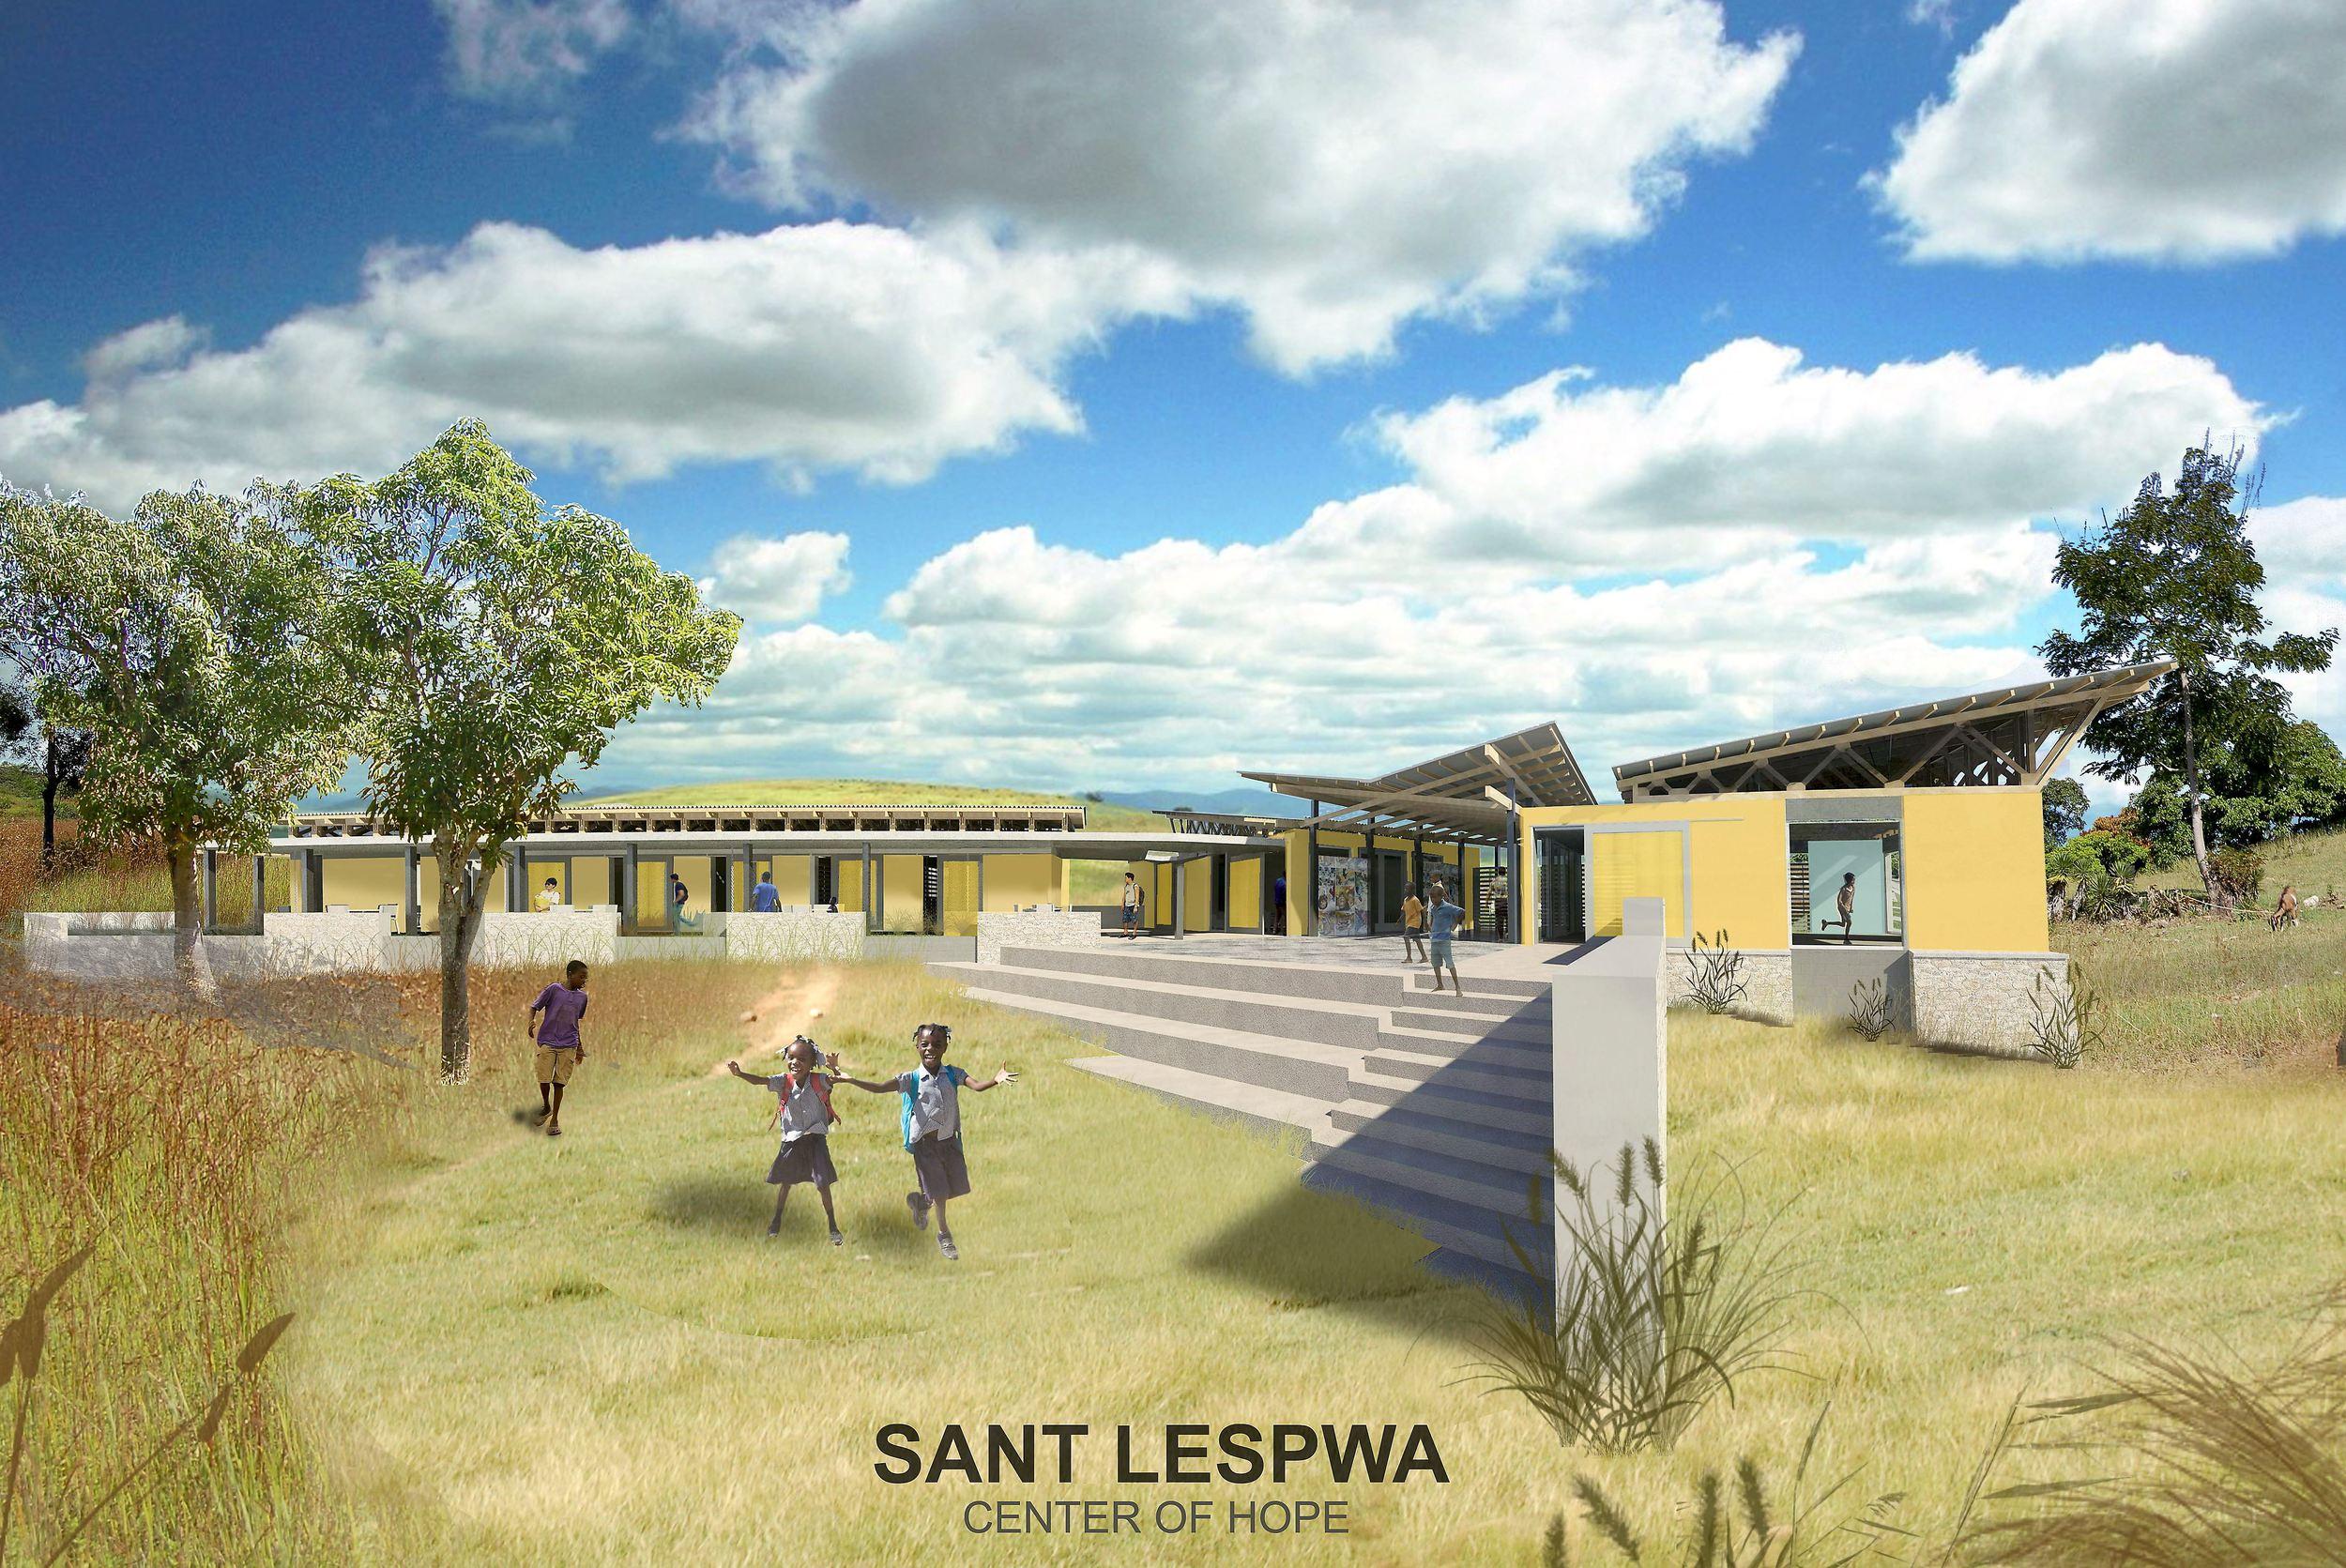 Architectural rendering of Sant Lespwa in Haiti.(Courtesy of Rothschild Doyno Collaborative)